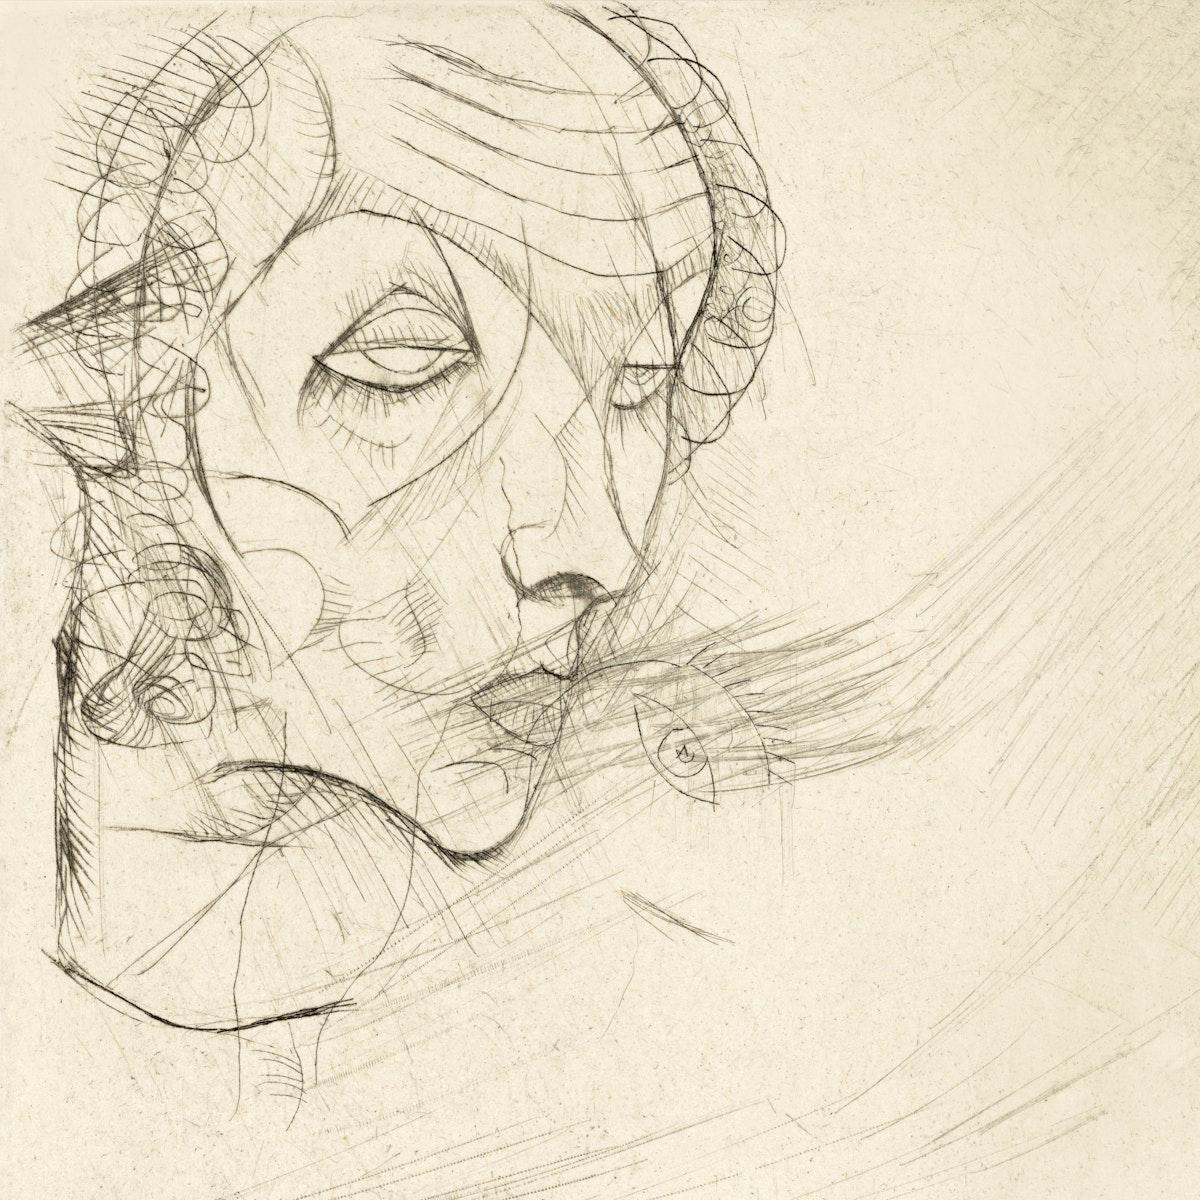 Self-portrait (1914) by Egon Schiele. Original female line art drawing from The MET museum. Digitally enhanced by rawpixel.